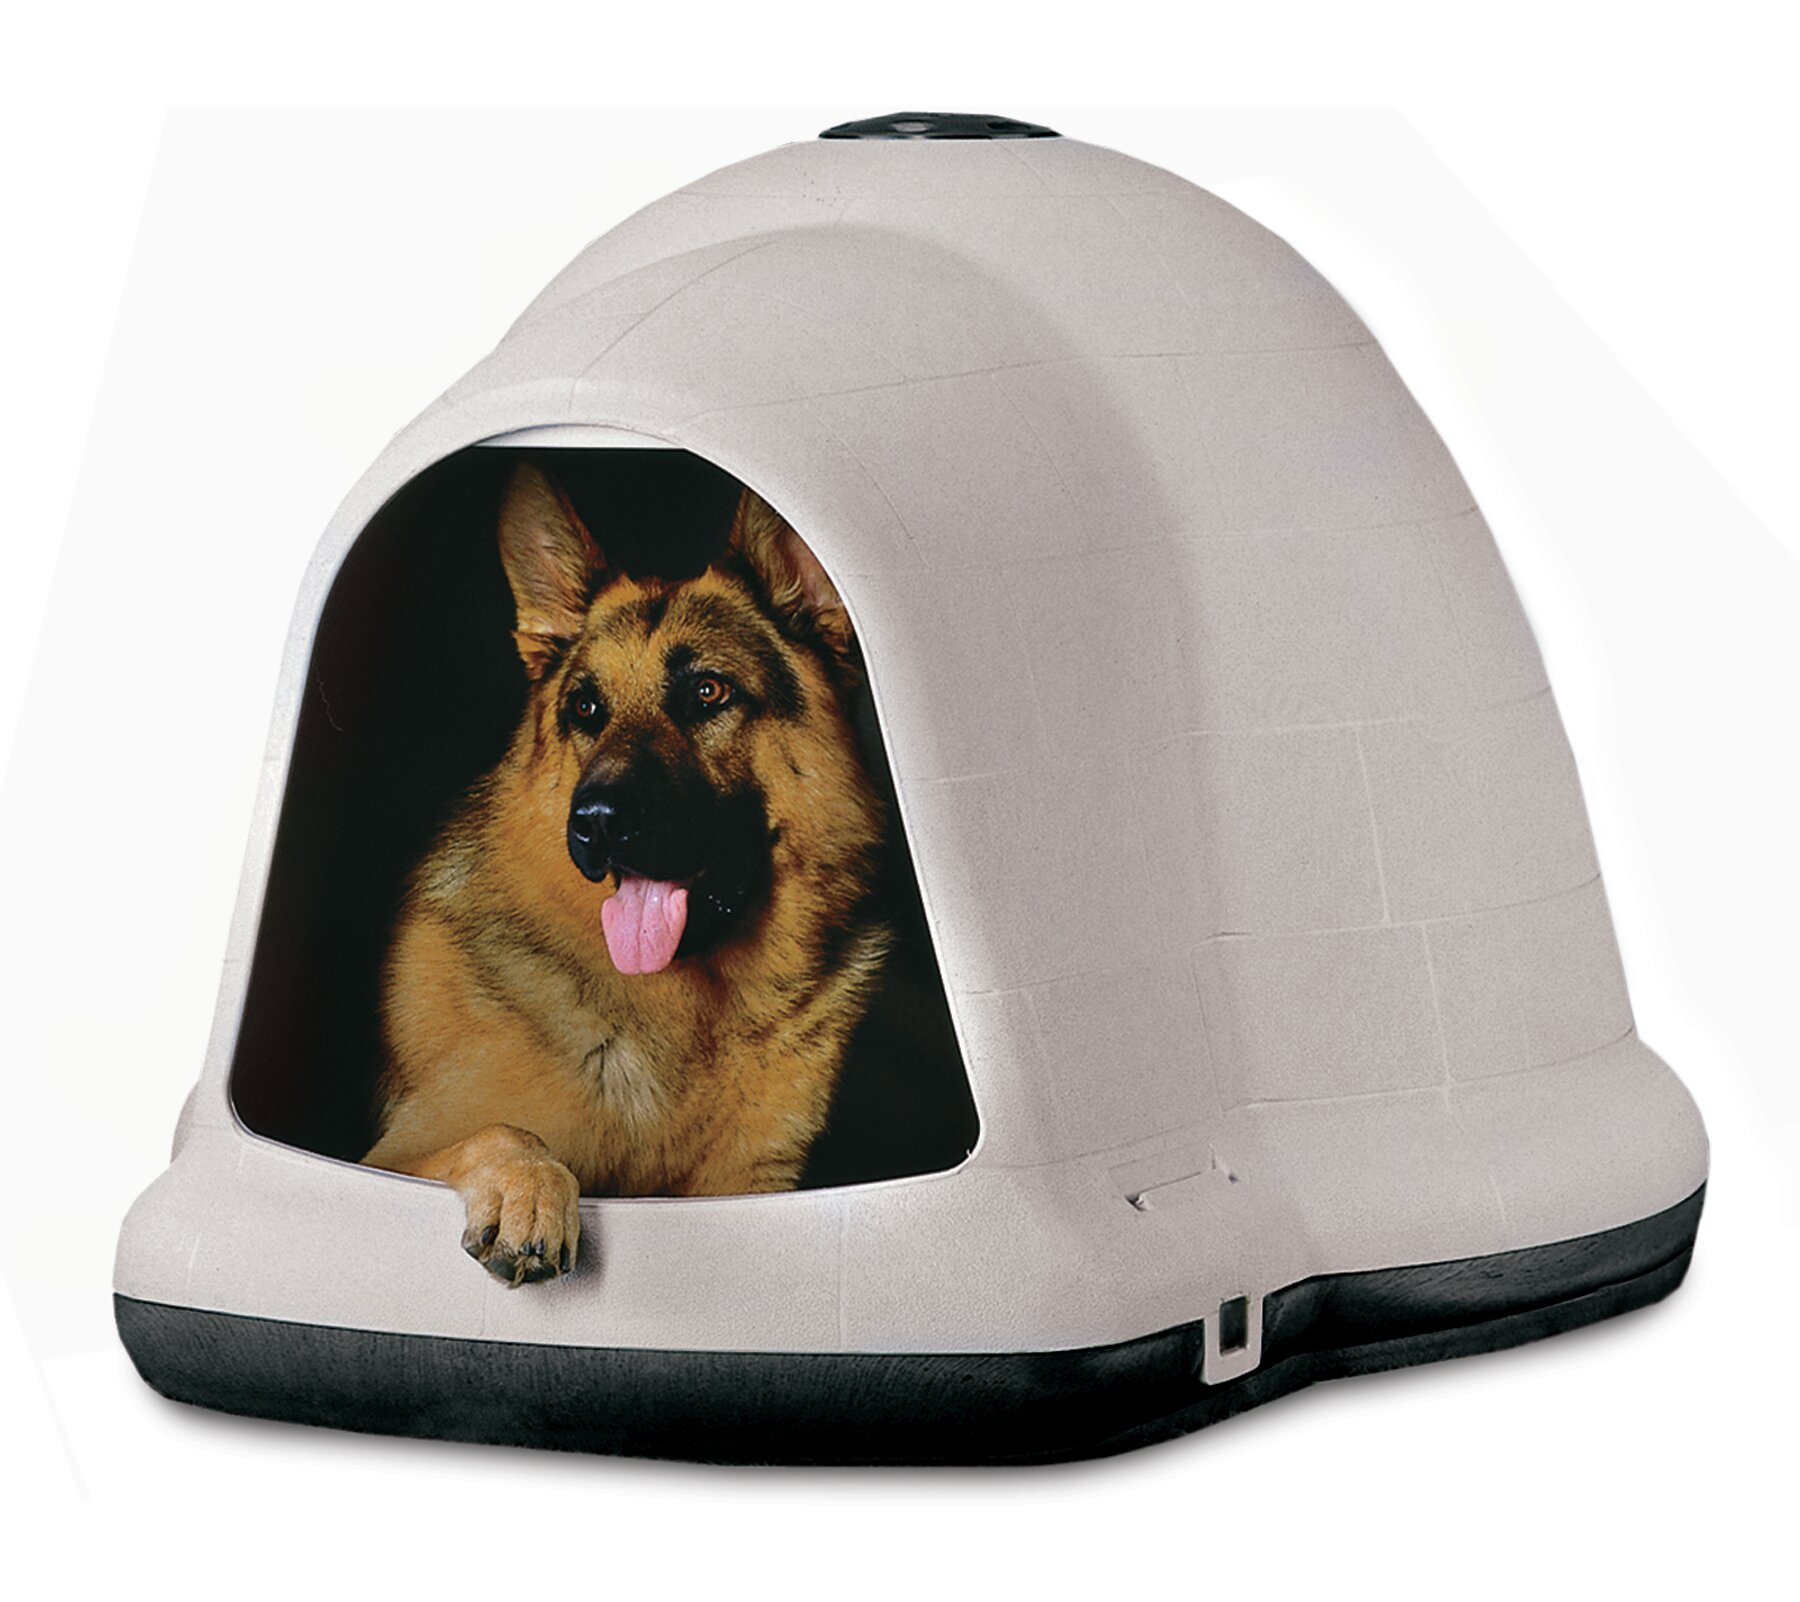 sc 1 st  Wayfair & Aspen Pet Dogloo II Dog House | Wayfair